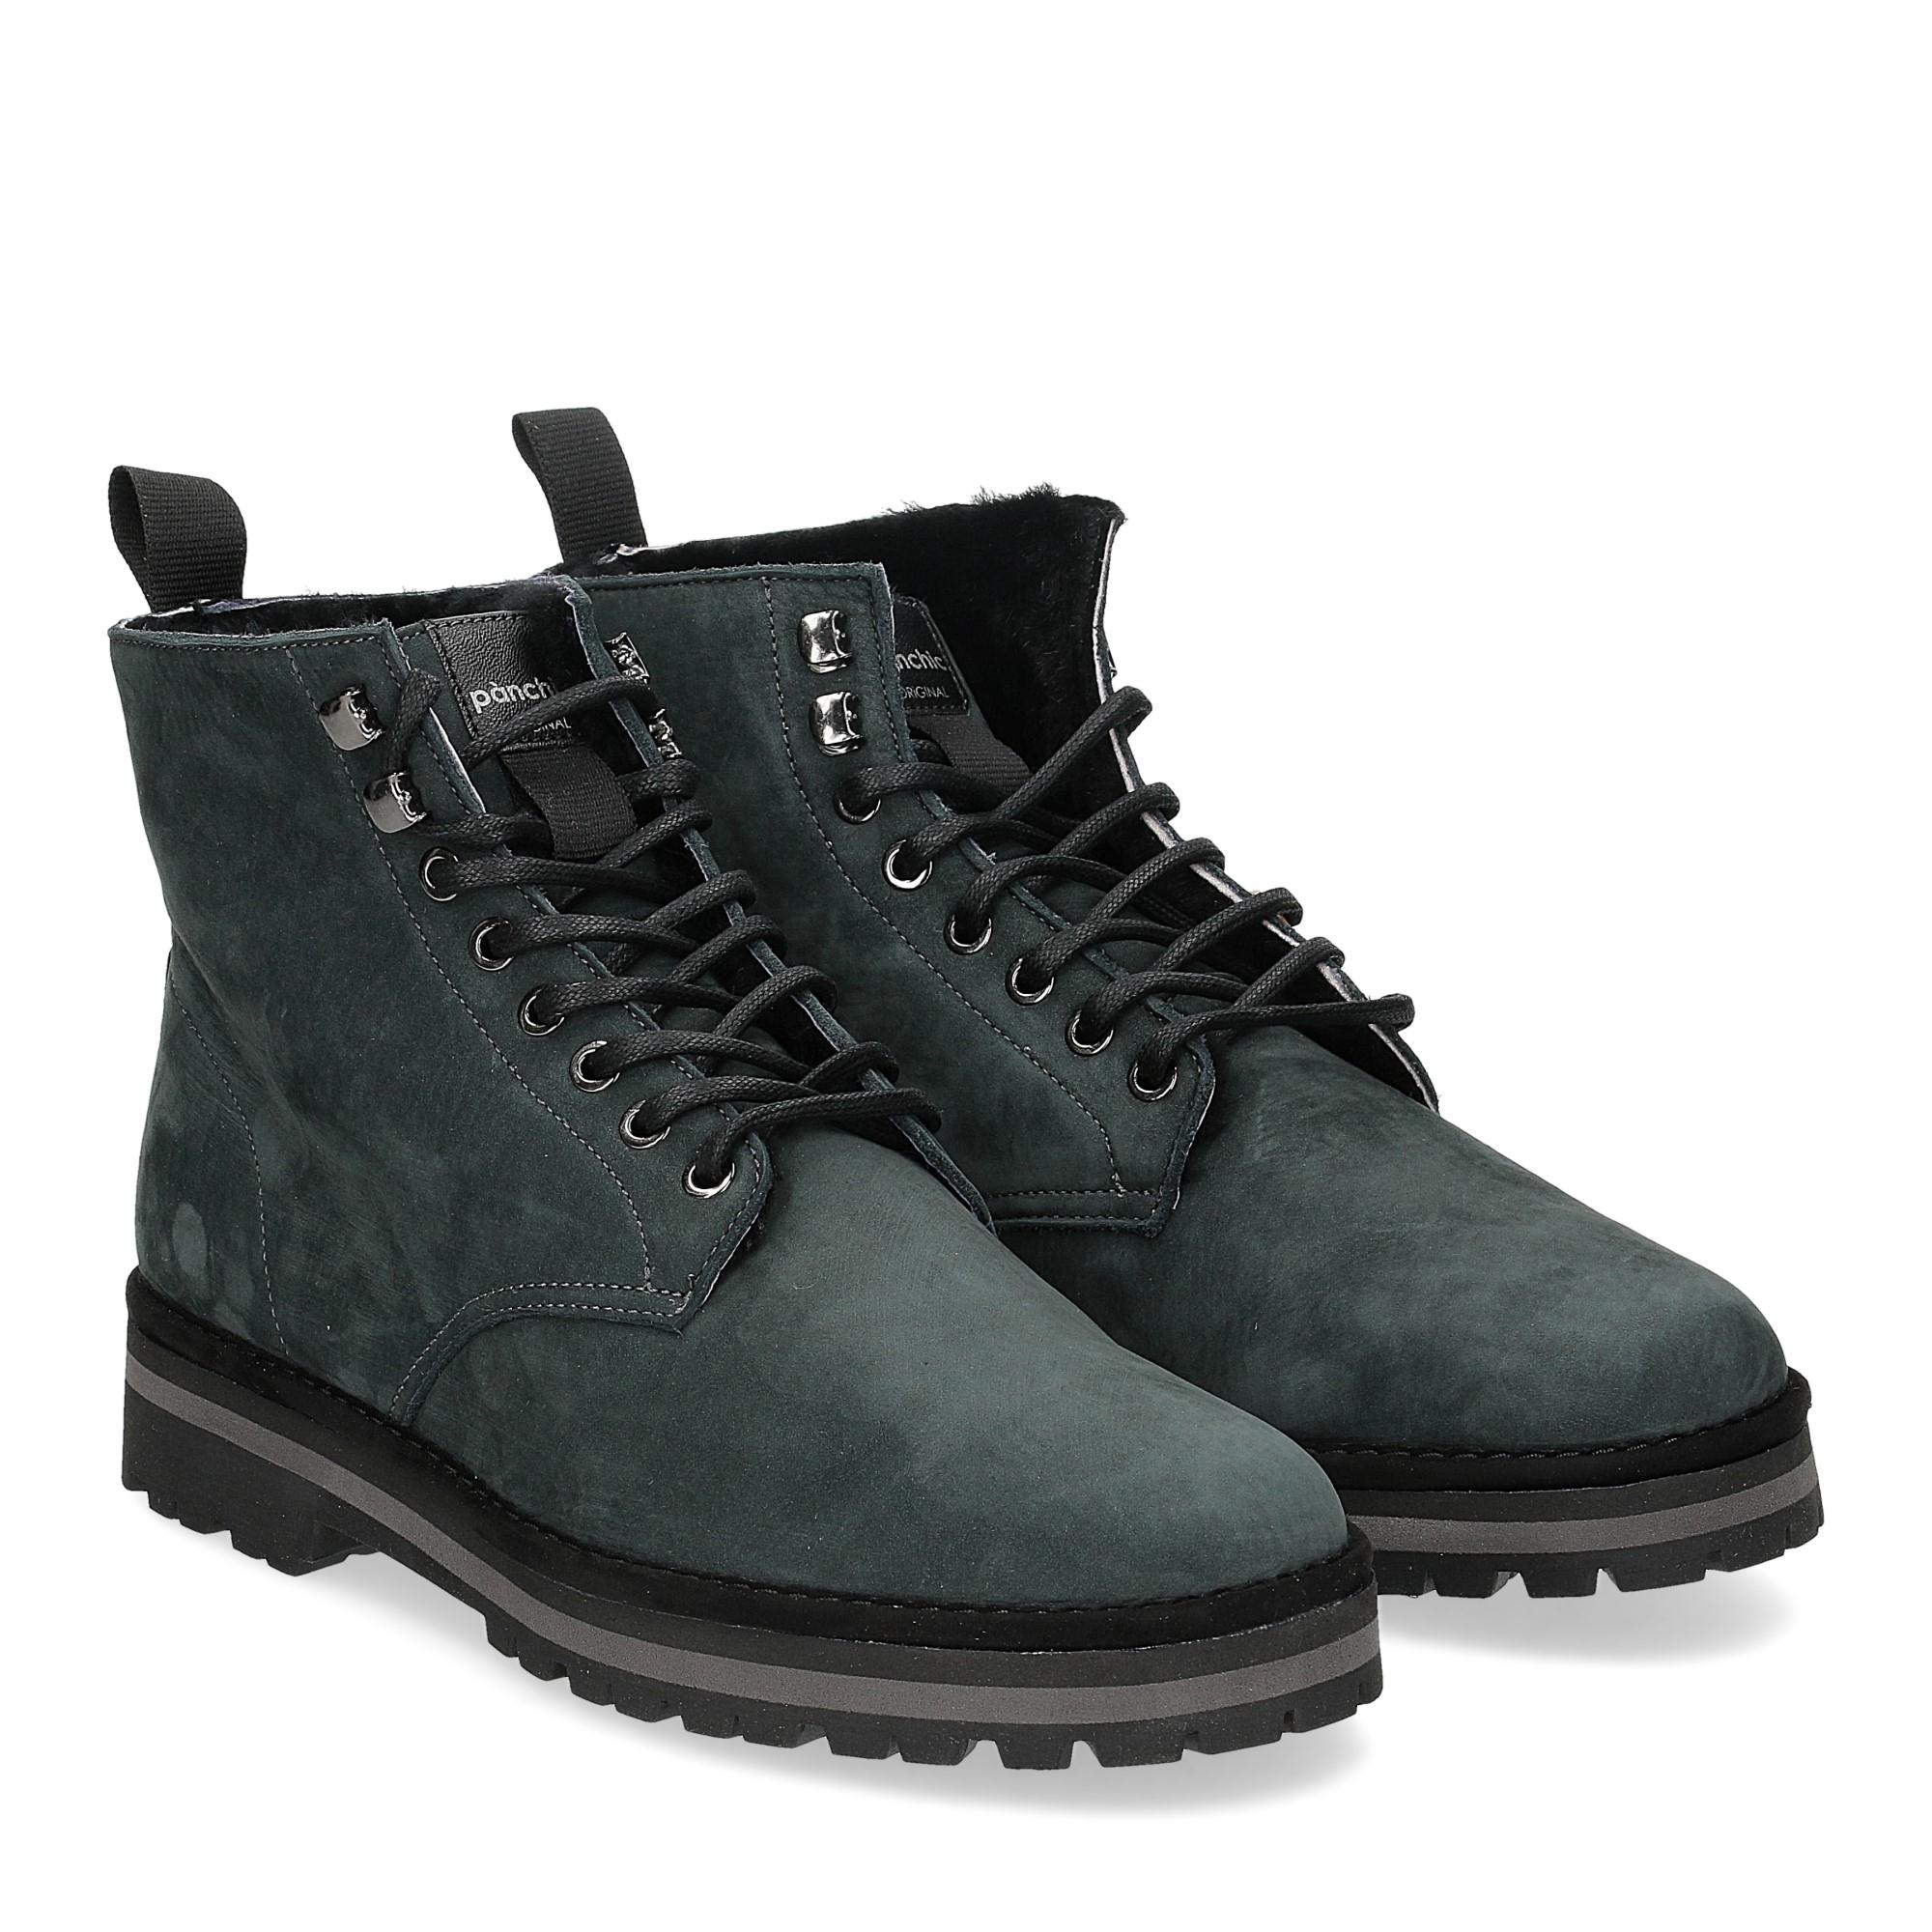 Panchic Ankle boot nubuk lining shearling deep